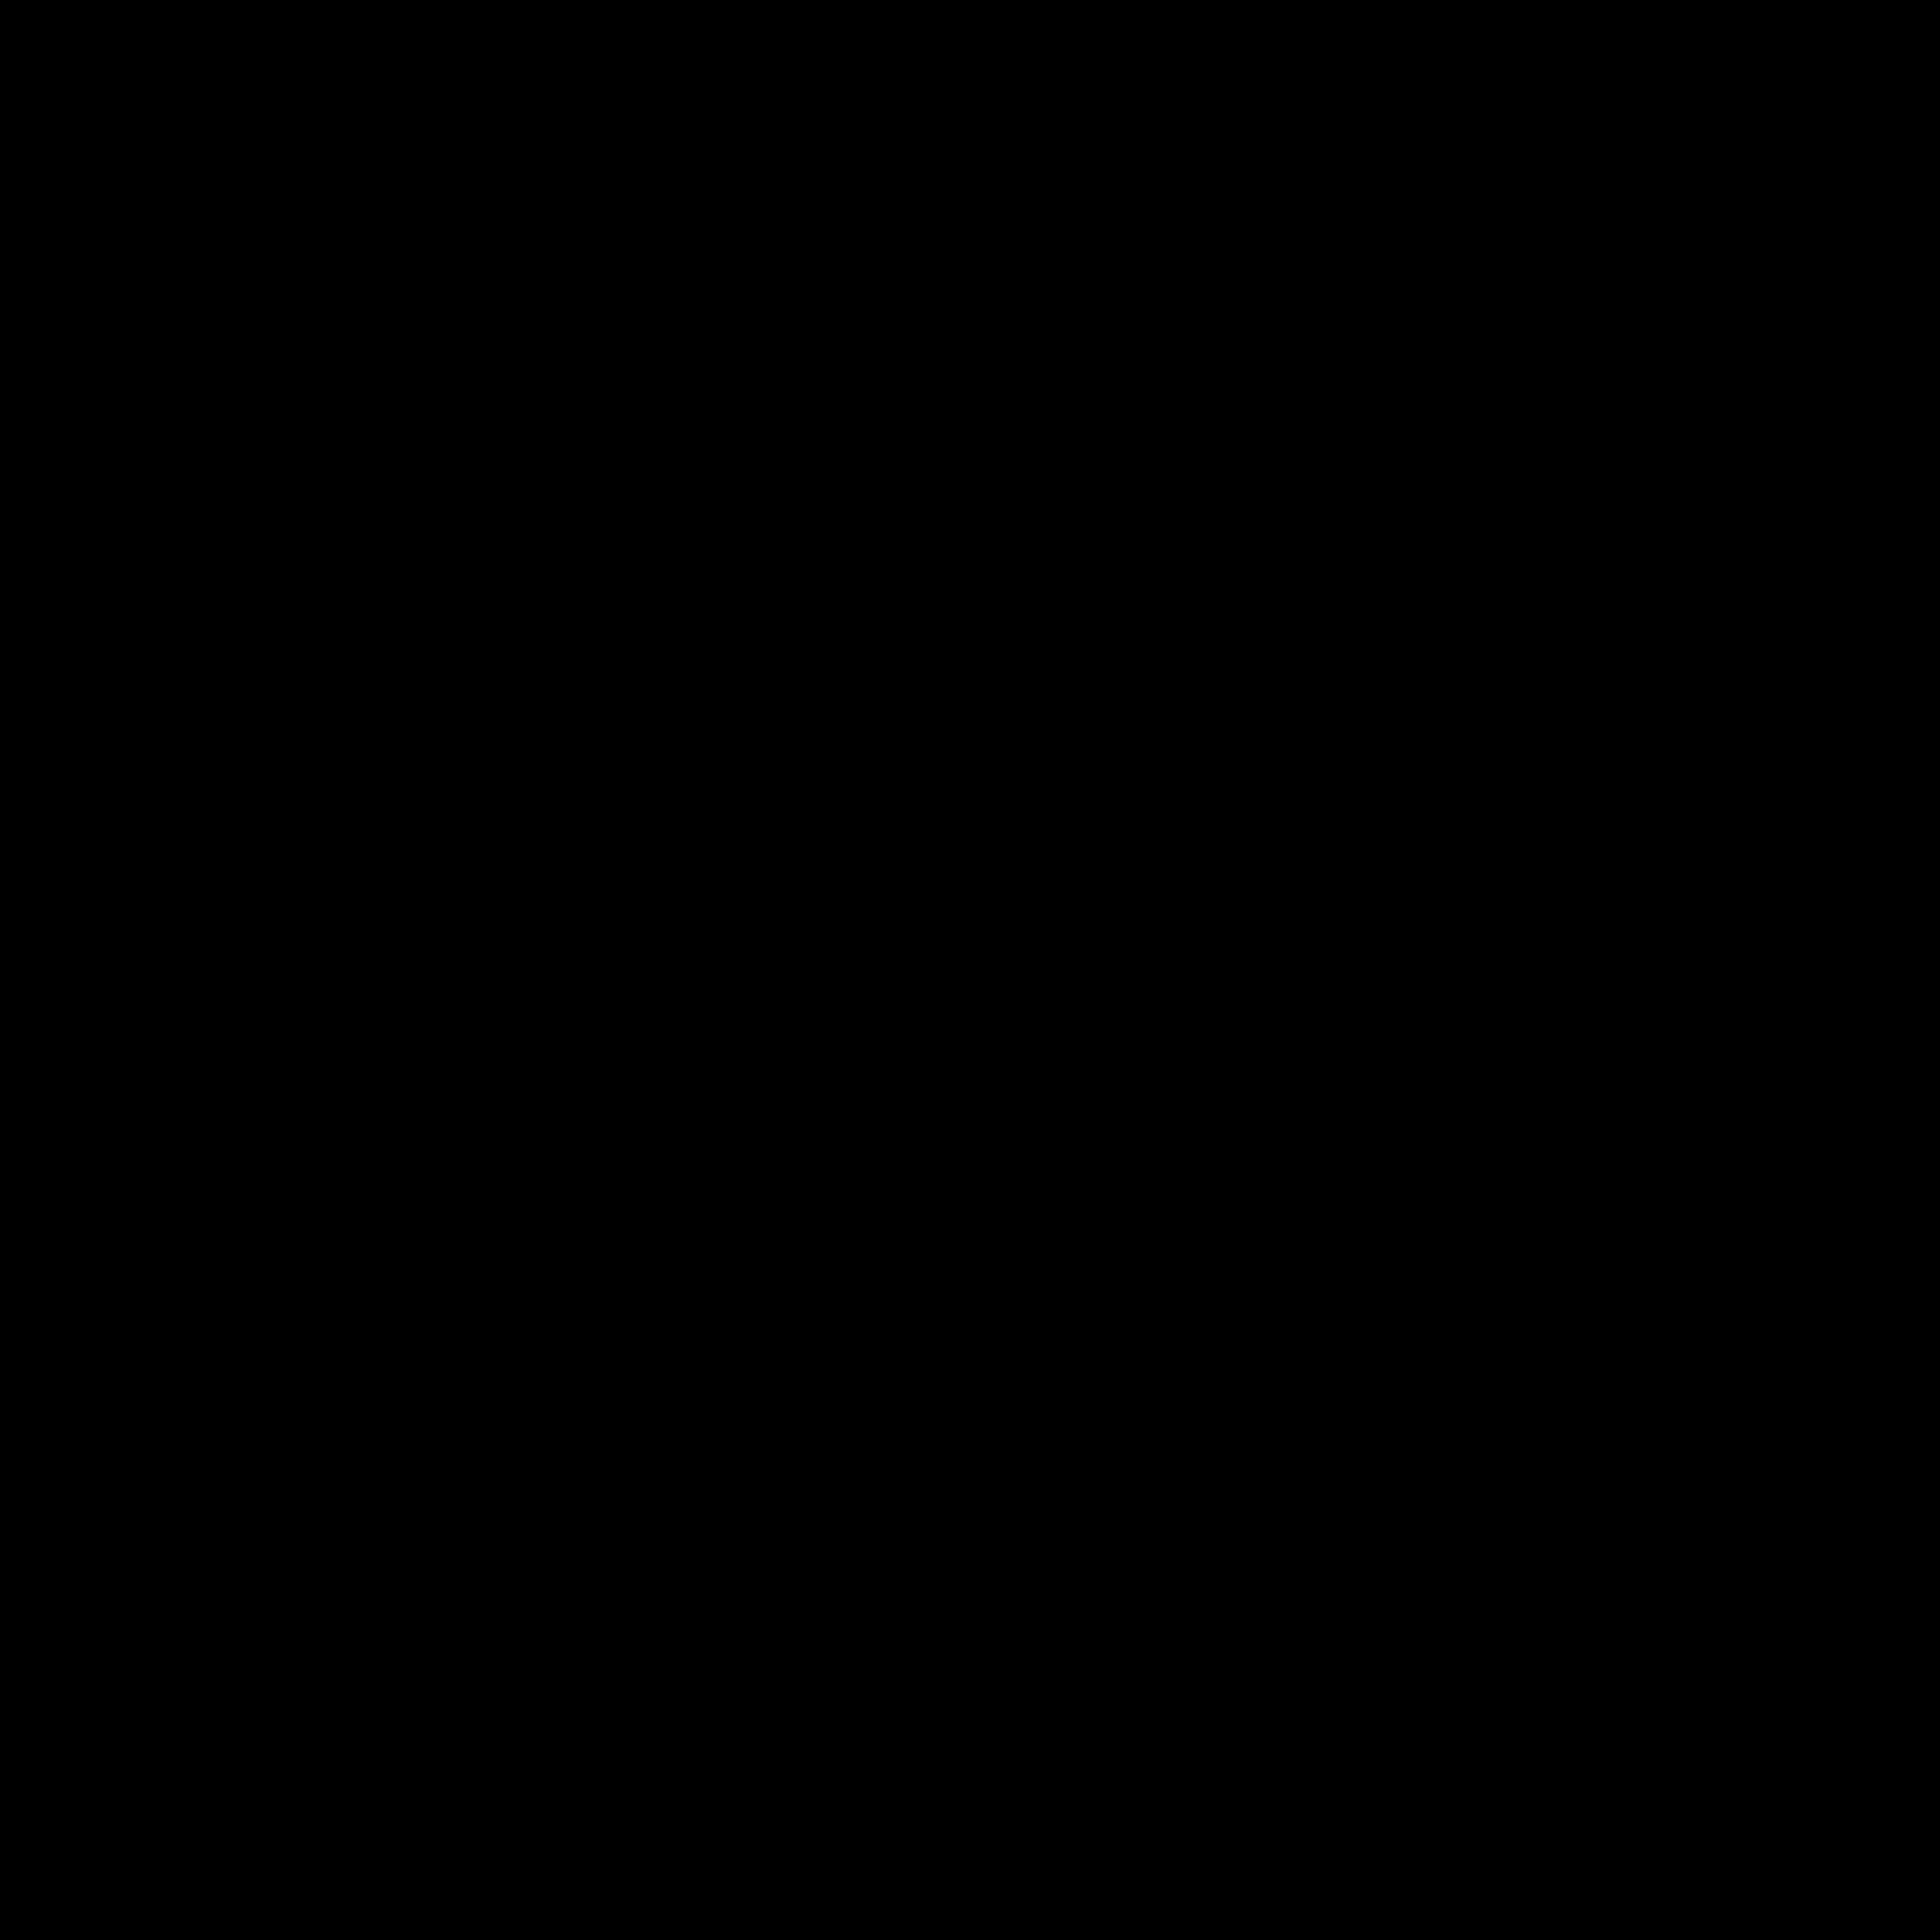 06 >> Poliestireno 06 Distintas Latitudes